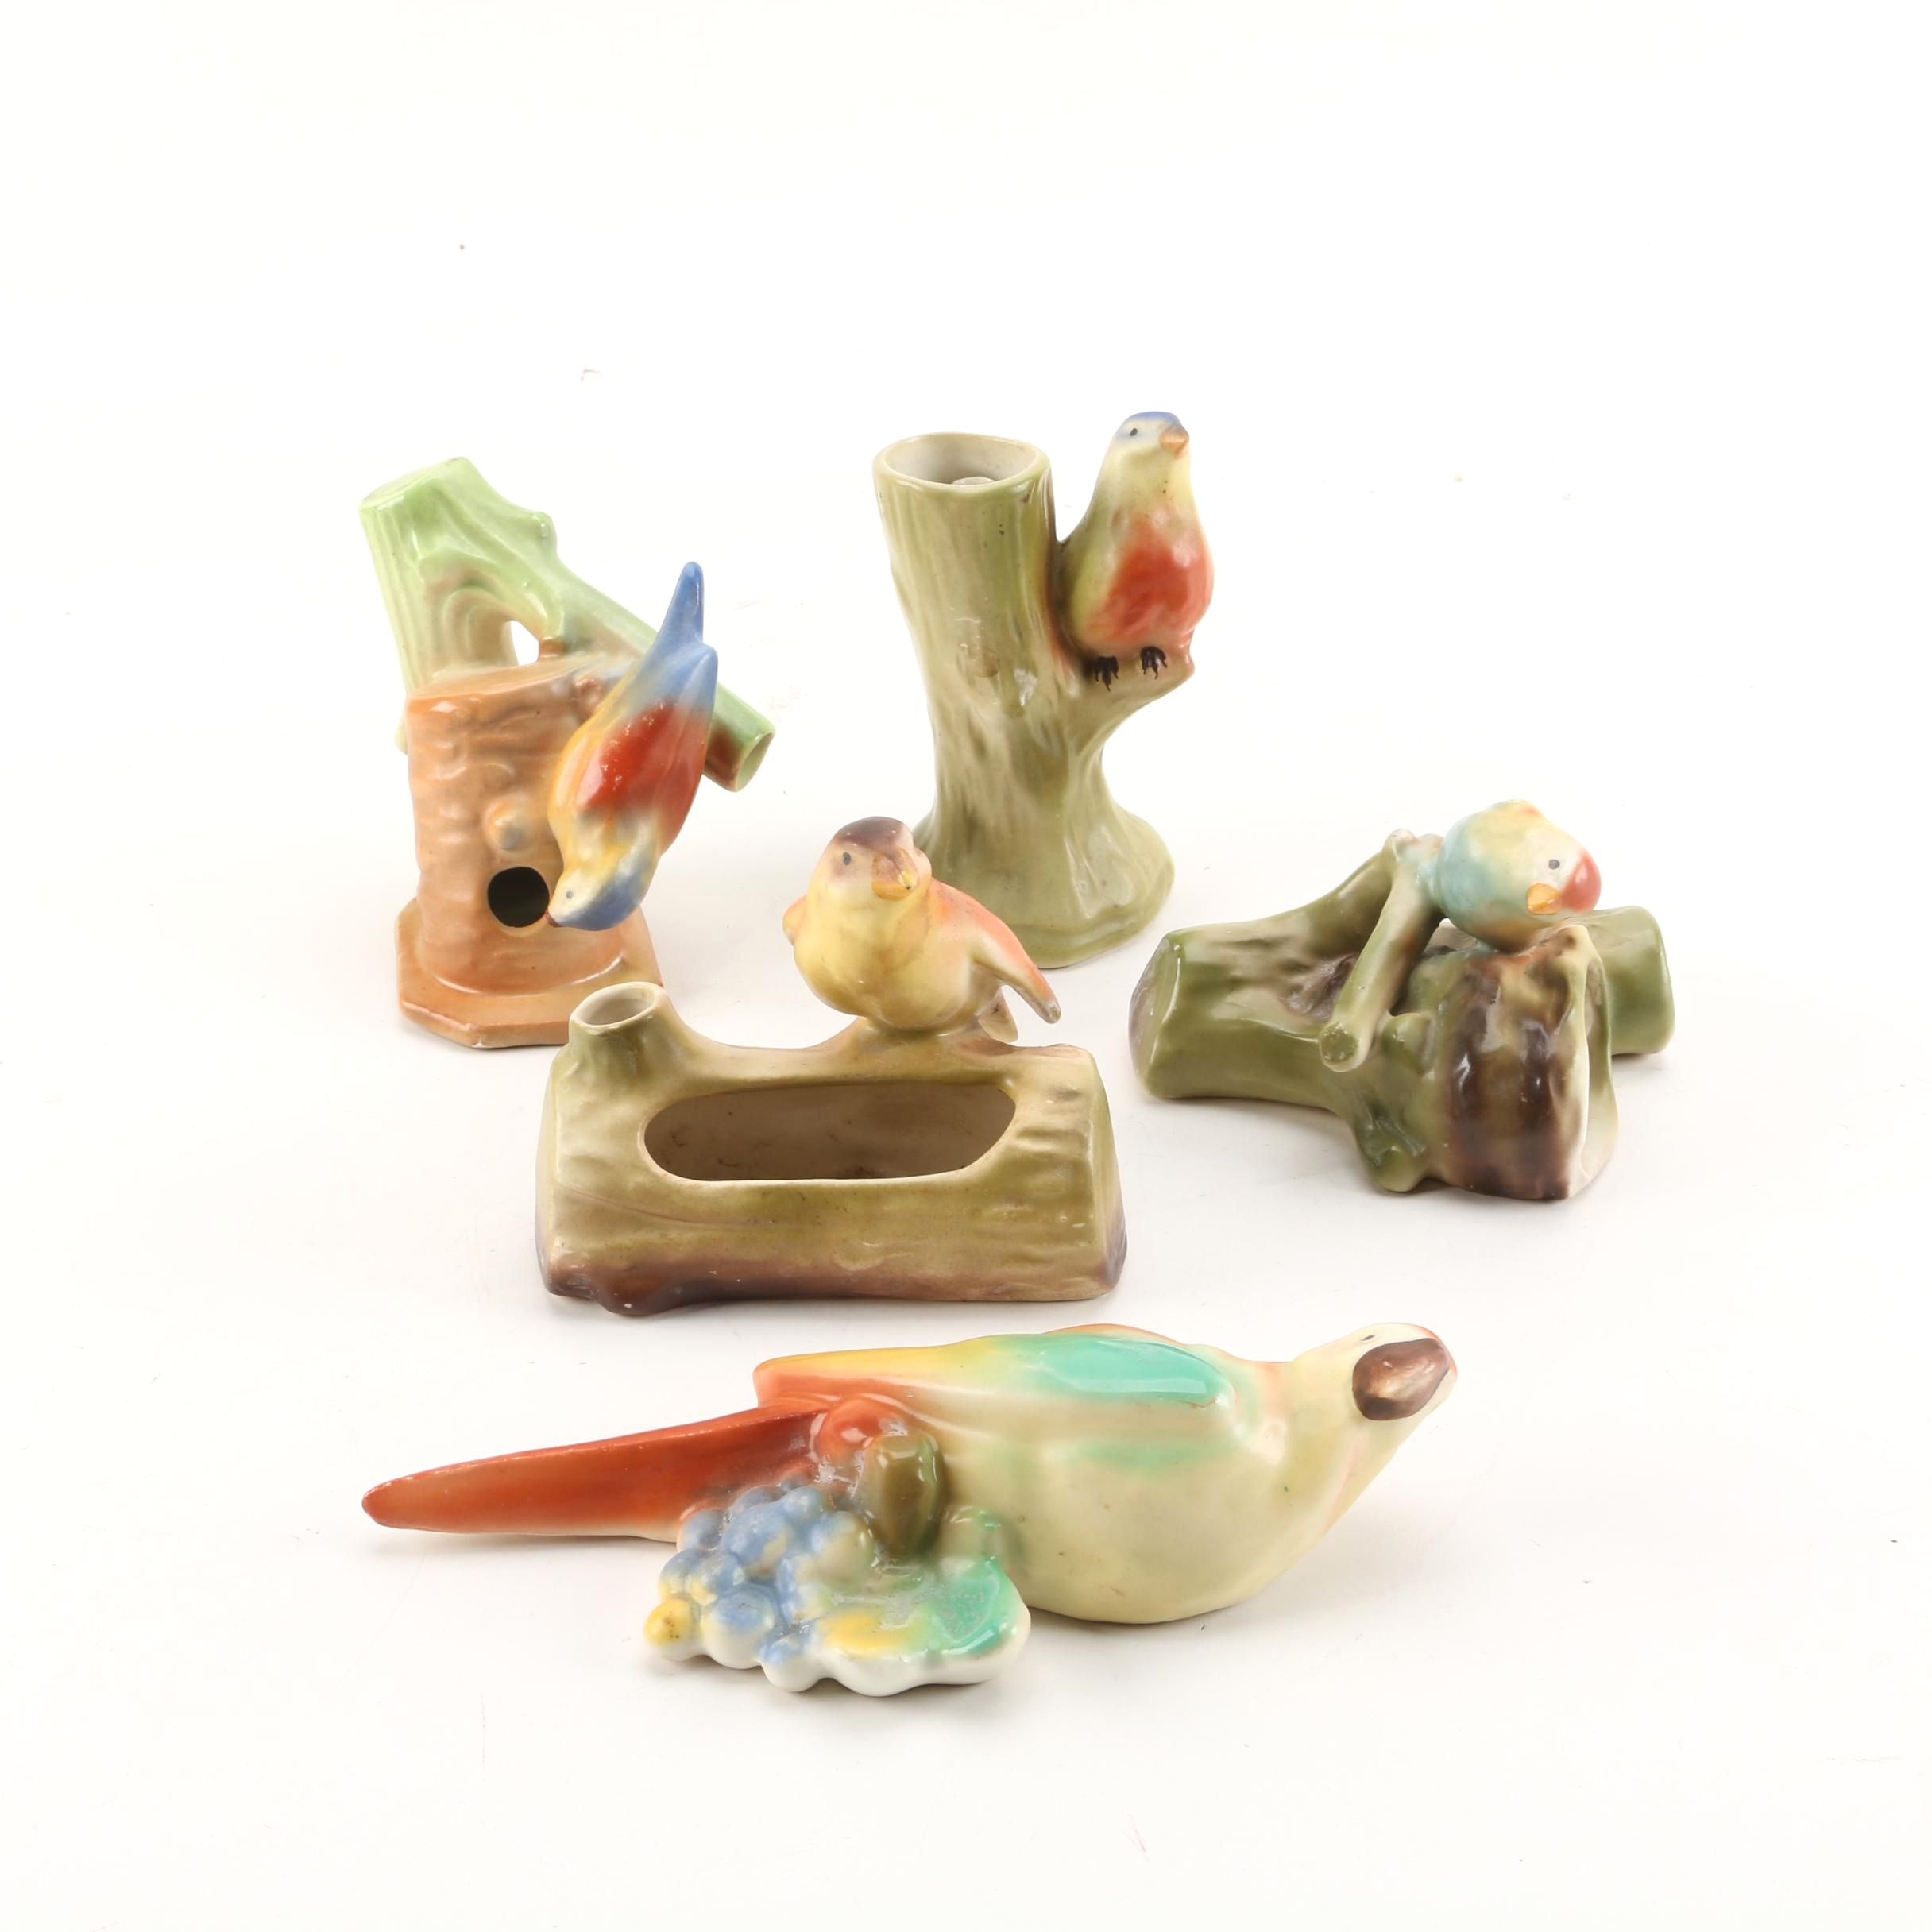 Vintage Czechoslovakian Ceramic Bird Planters and Wall Pockets